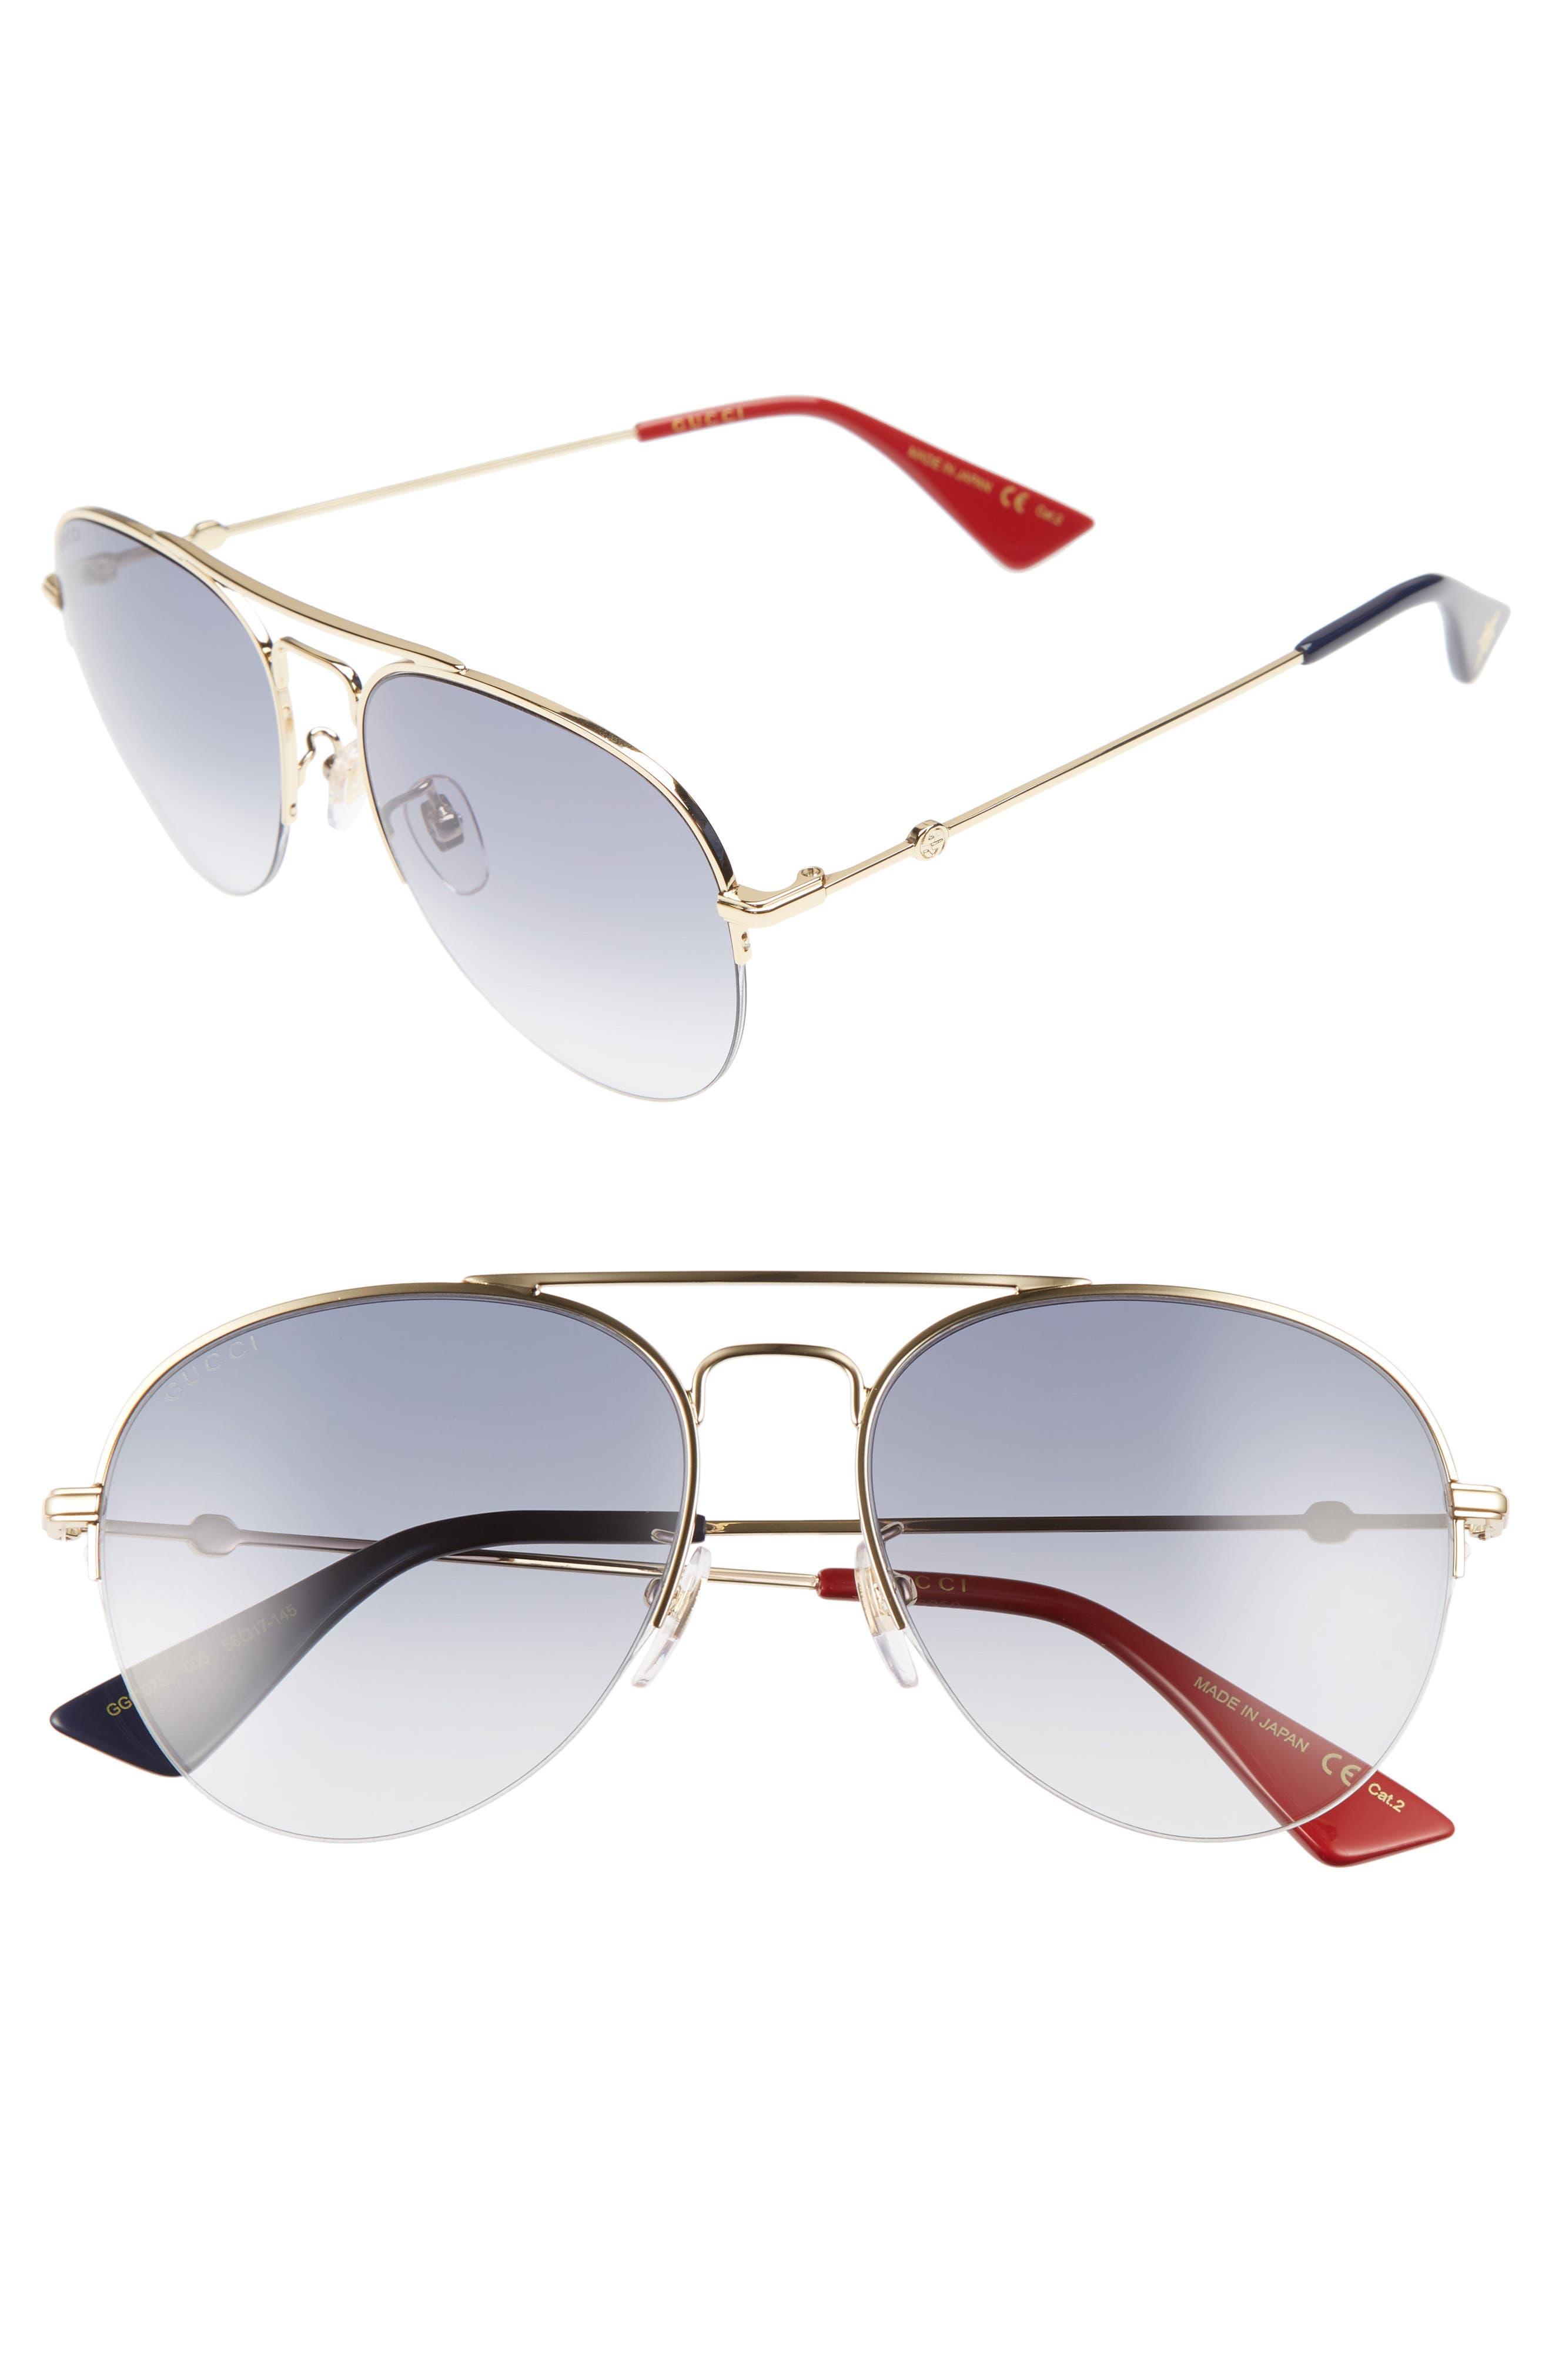 Main Image - Gucci 56mm Aviator Sunglasses